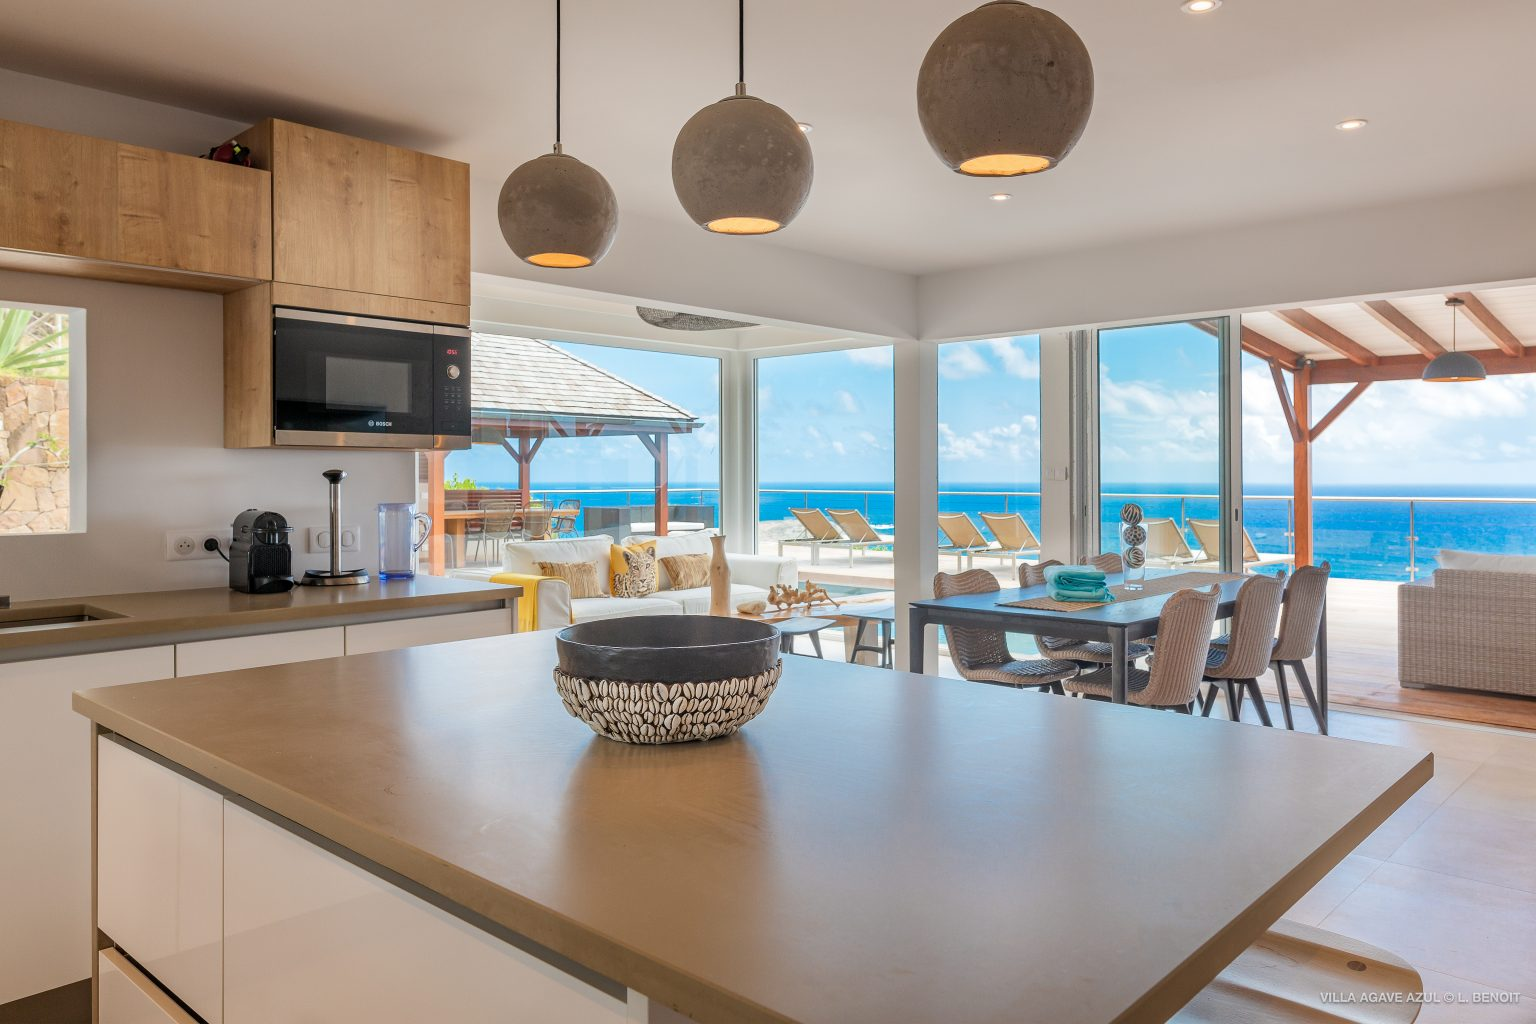 Villa Agave Azul - Villa Rental Lagoon of Grand Cul de Sac and Ocean view - Indoor